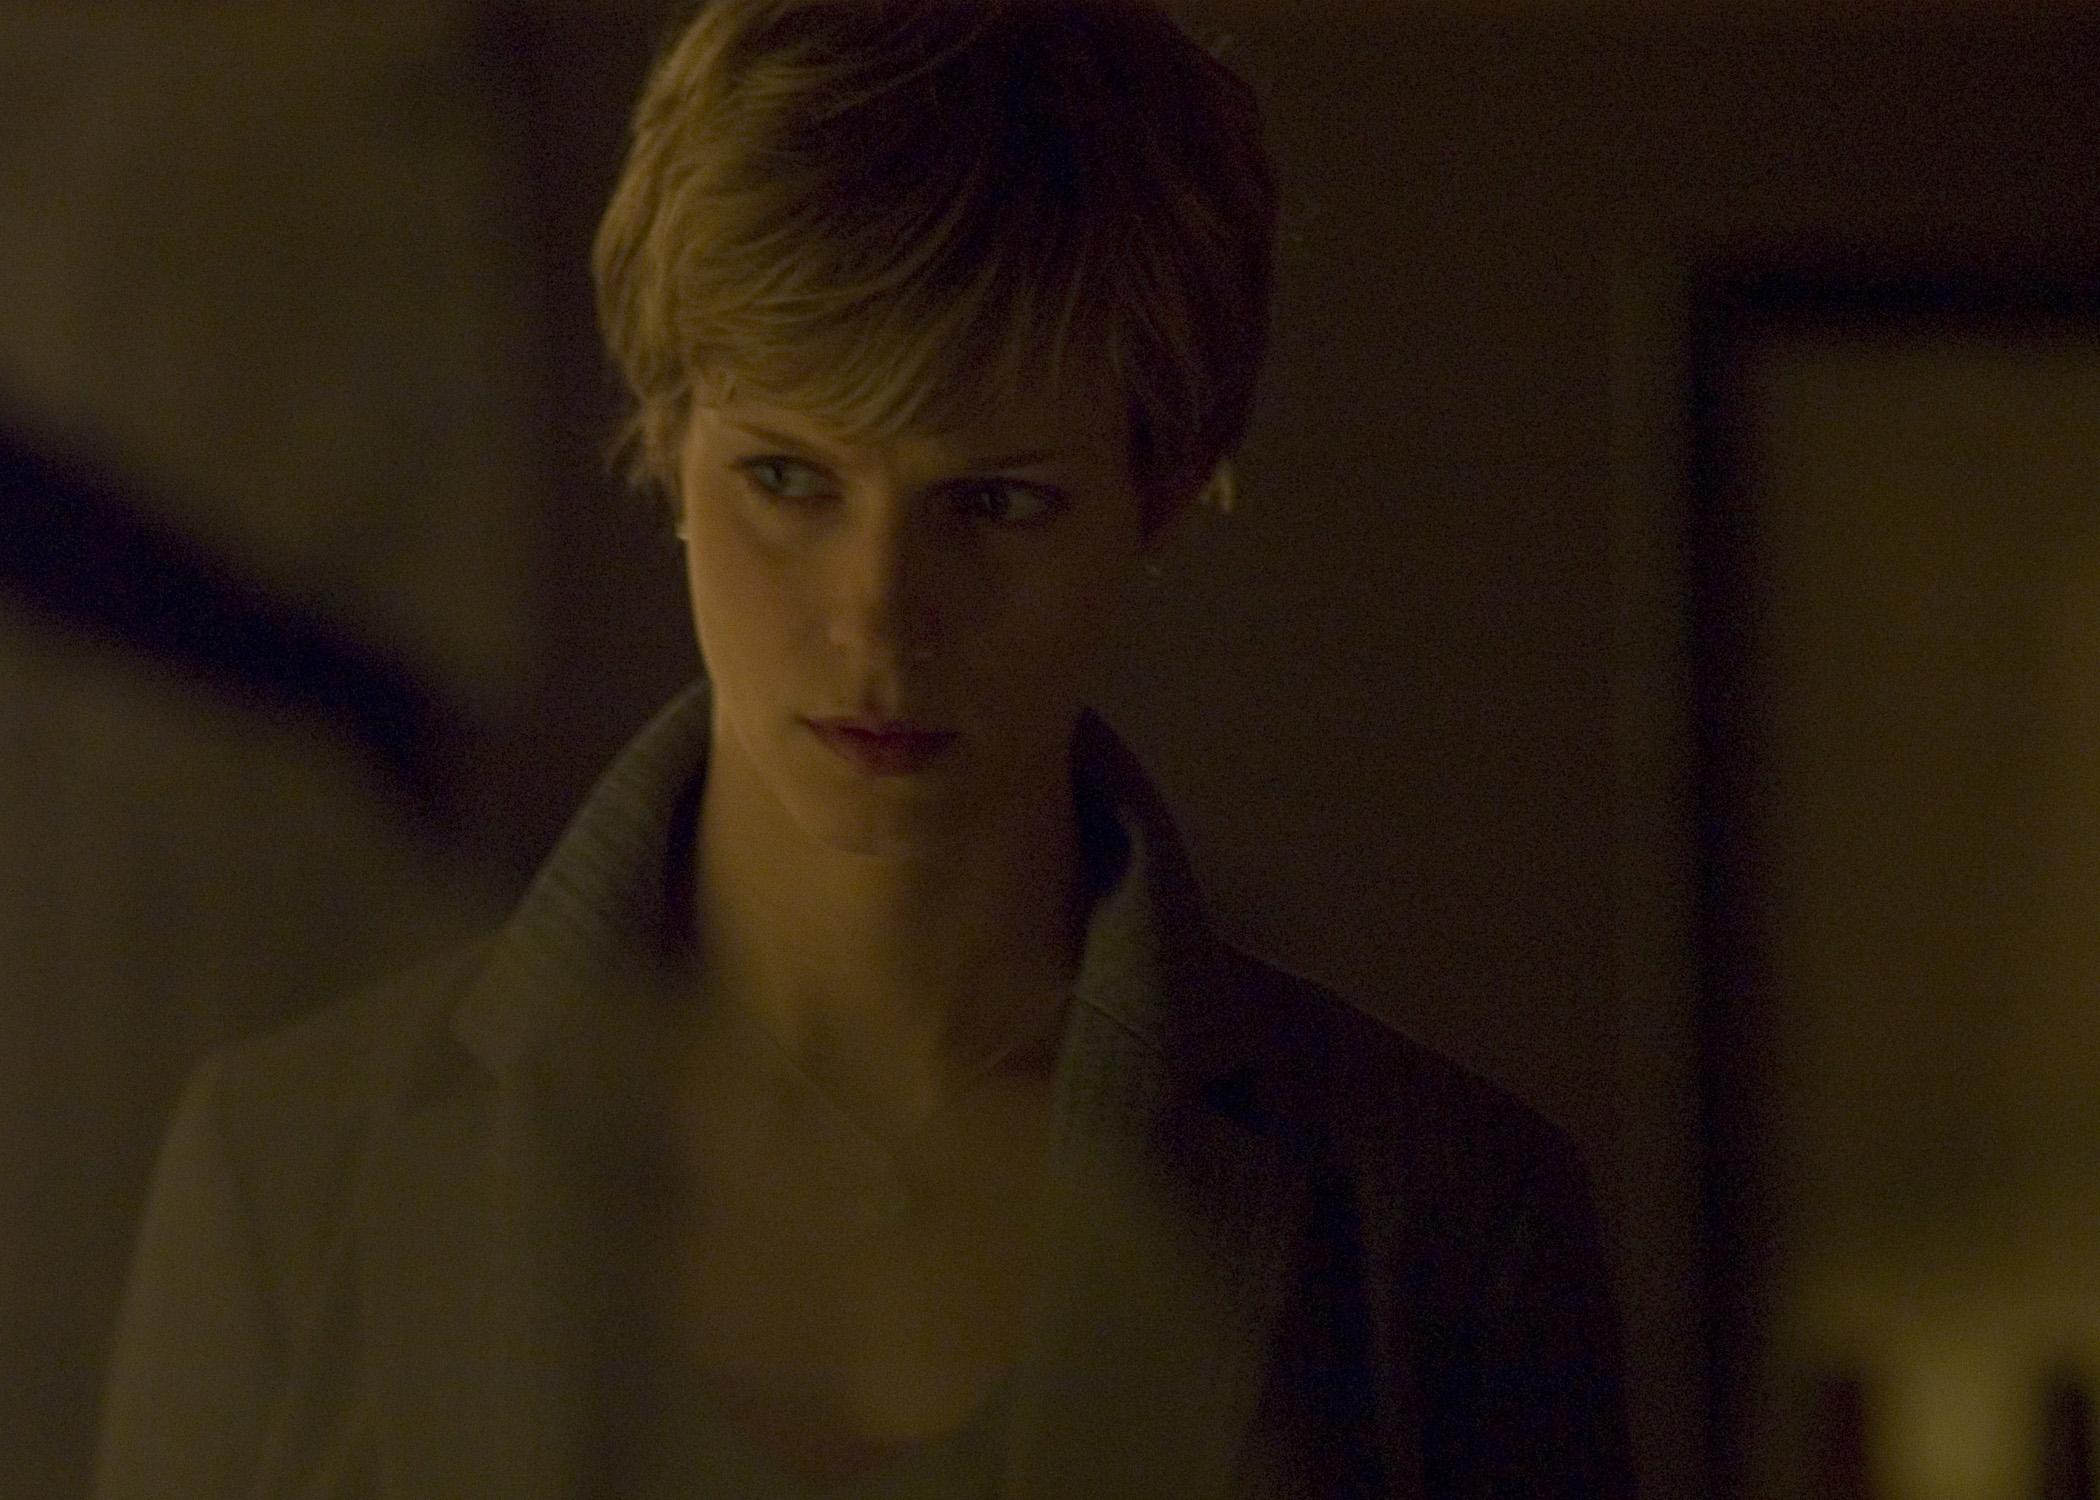 Laura Regan in Hollow Man II (2006)